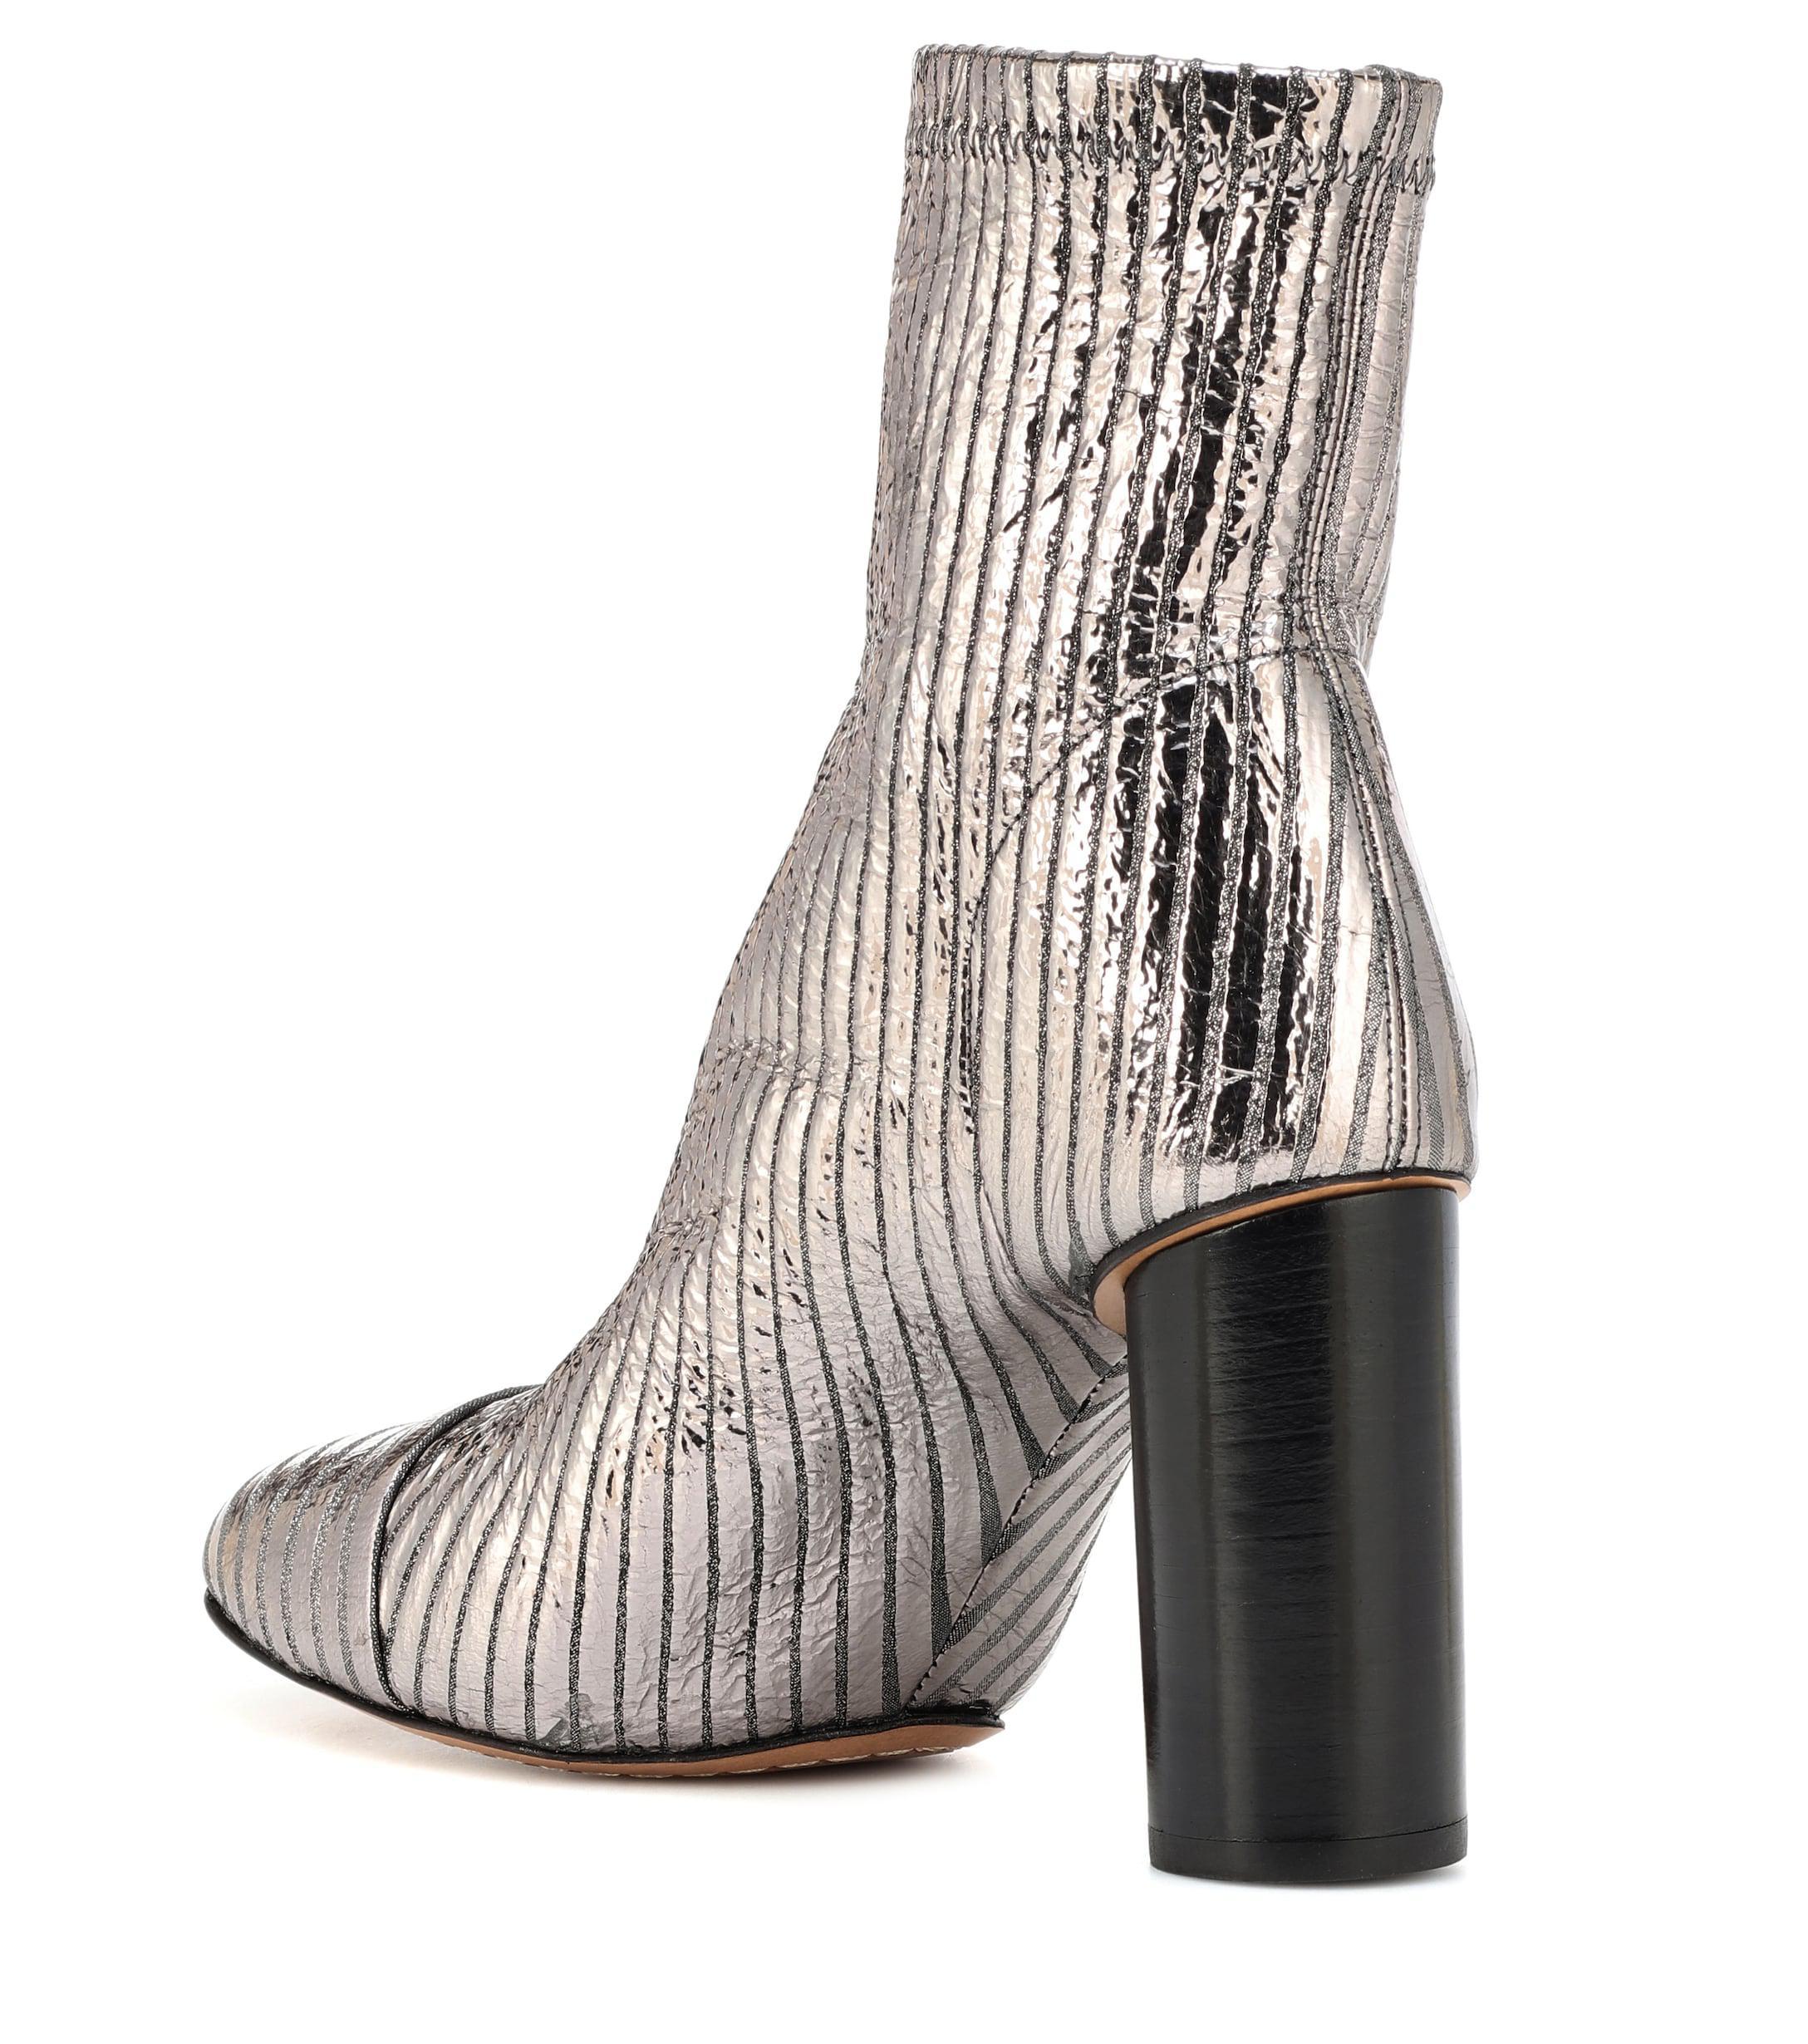 8cd91b44a2a Isabel Marant - Rillyan Metallic Leather Ankle Boots - Lyst. View fullscreen